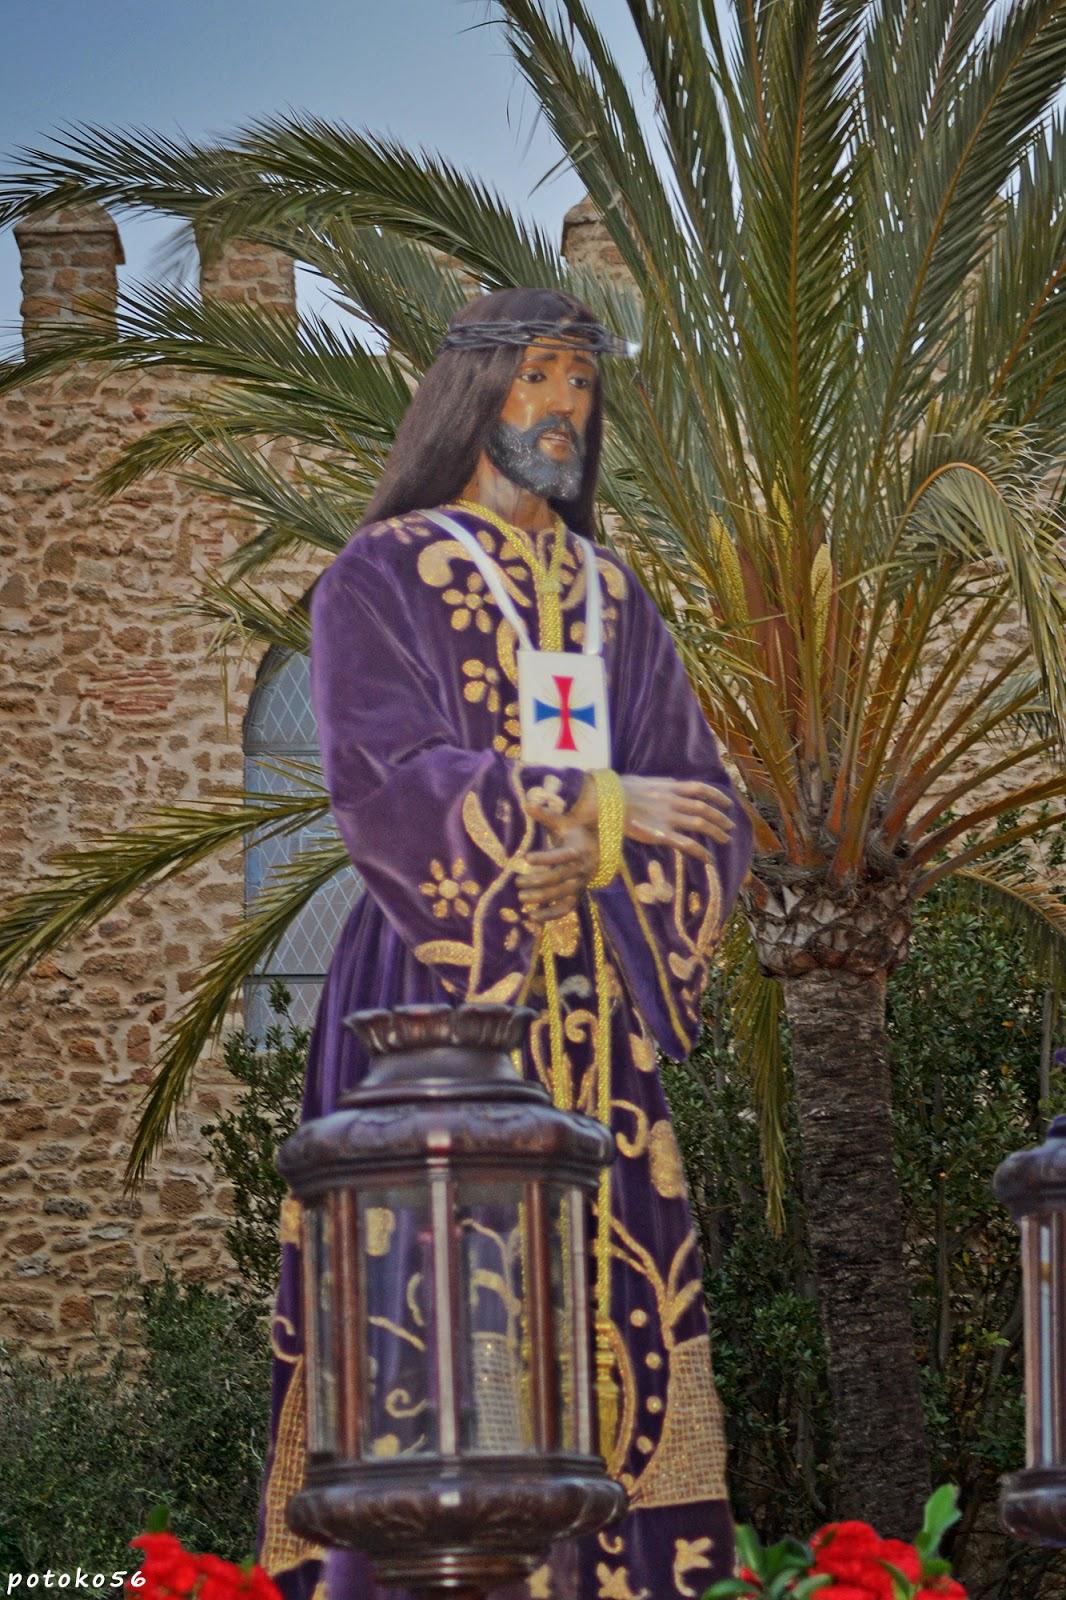 Traslado de Ntro. Padre Jesús Cautivo a la Parroquia de la O Rota